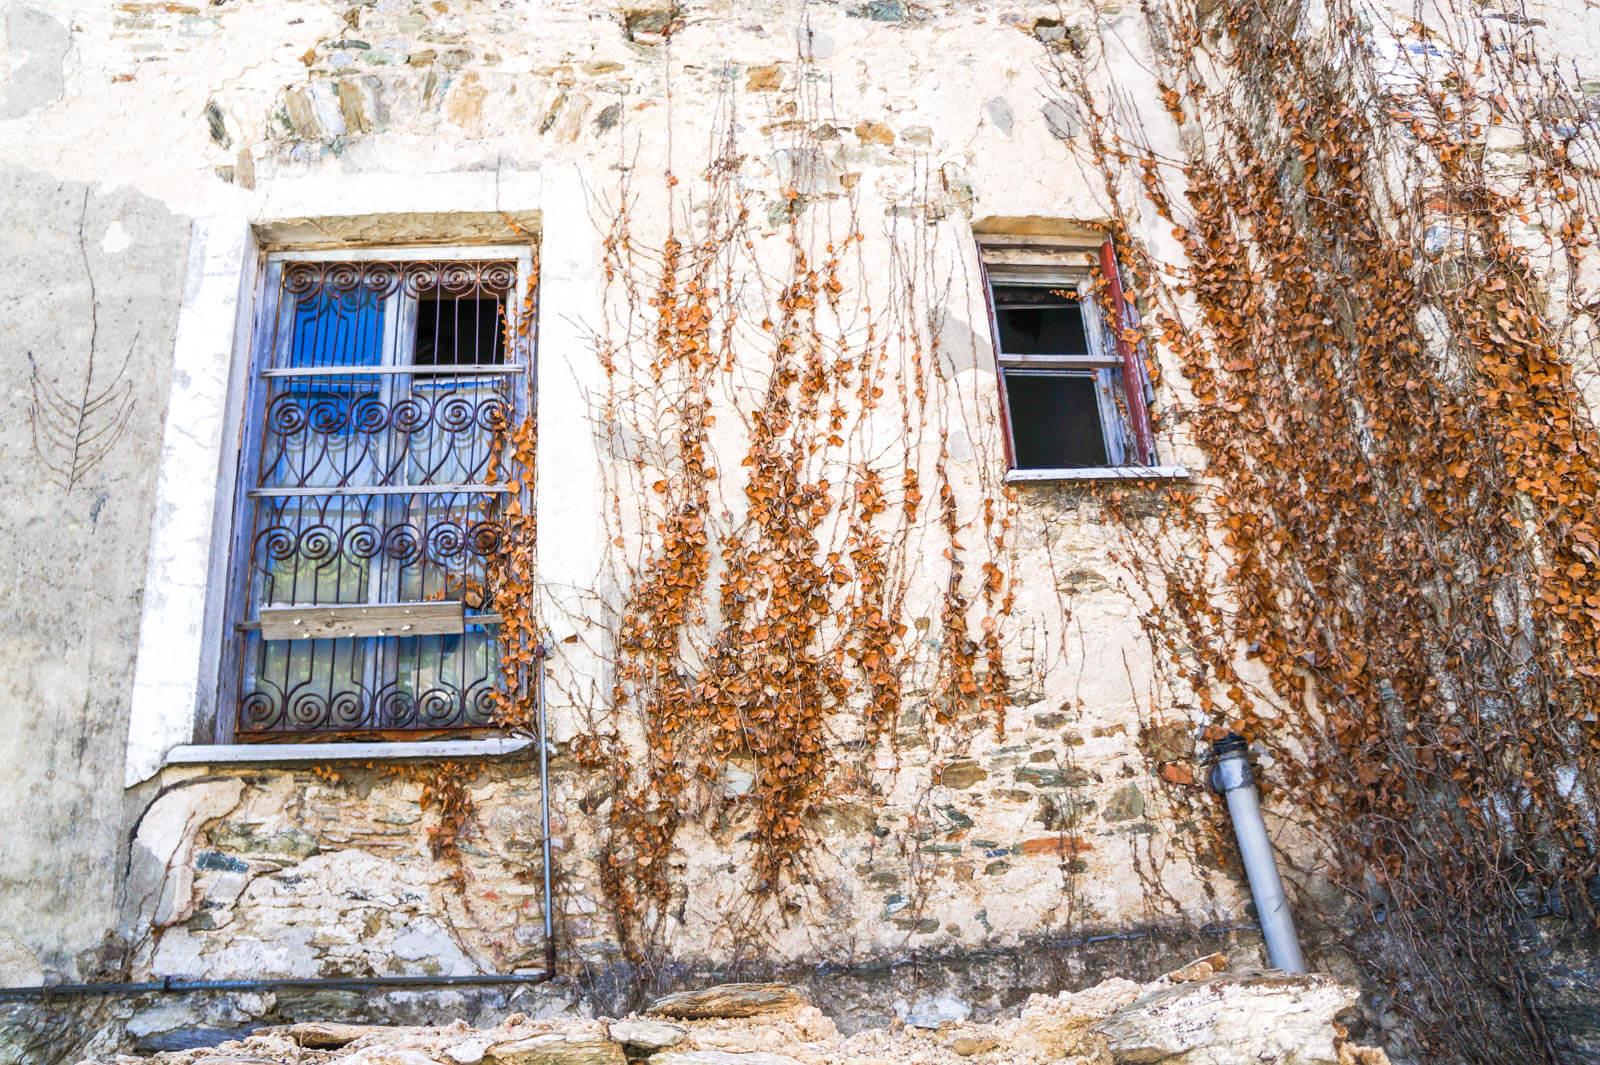 portaria-pelion-greece-la-vie-en-blog-all-rights-reserved-81